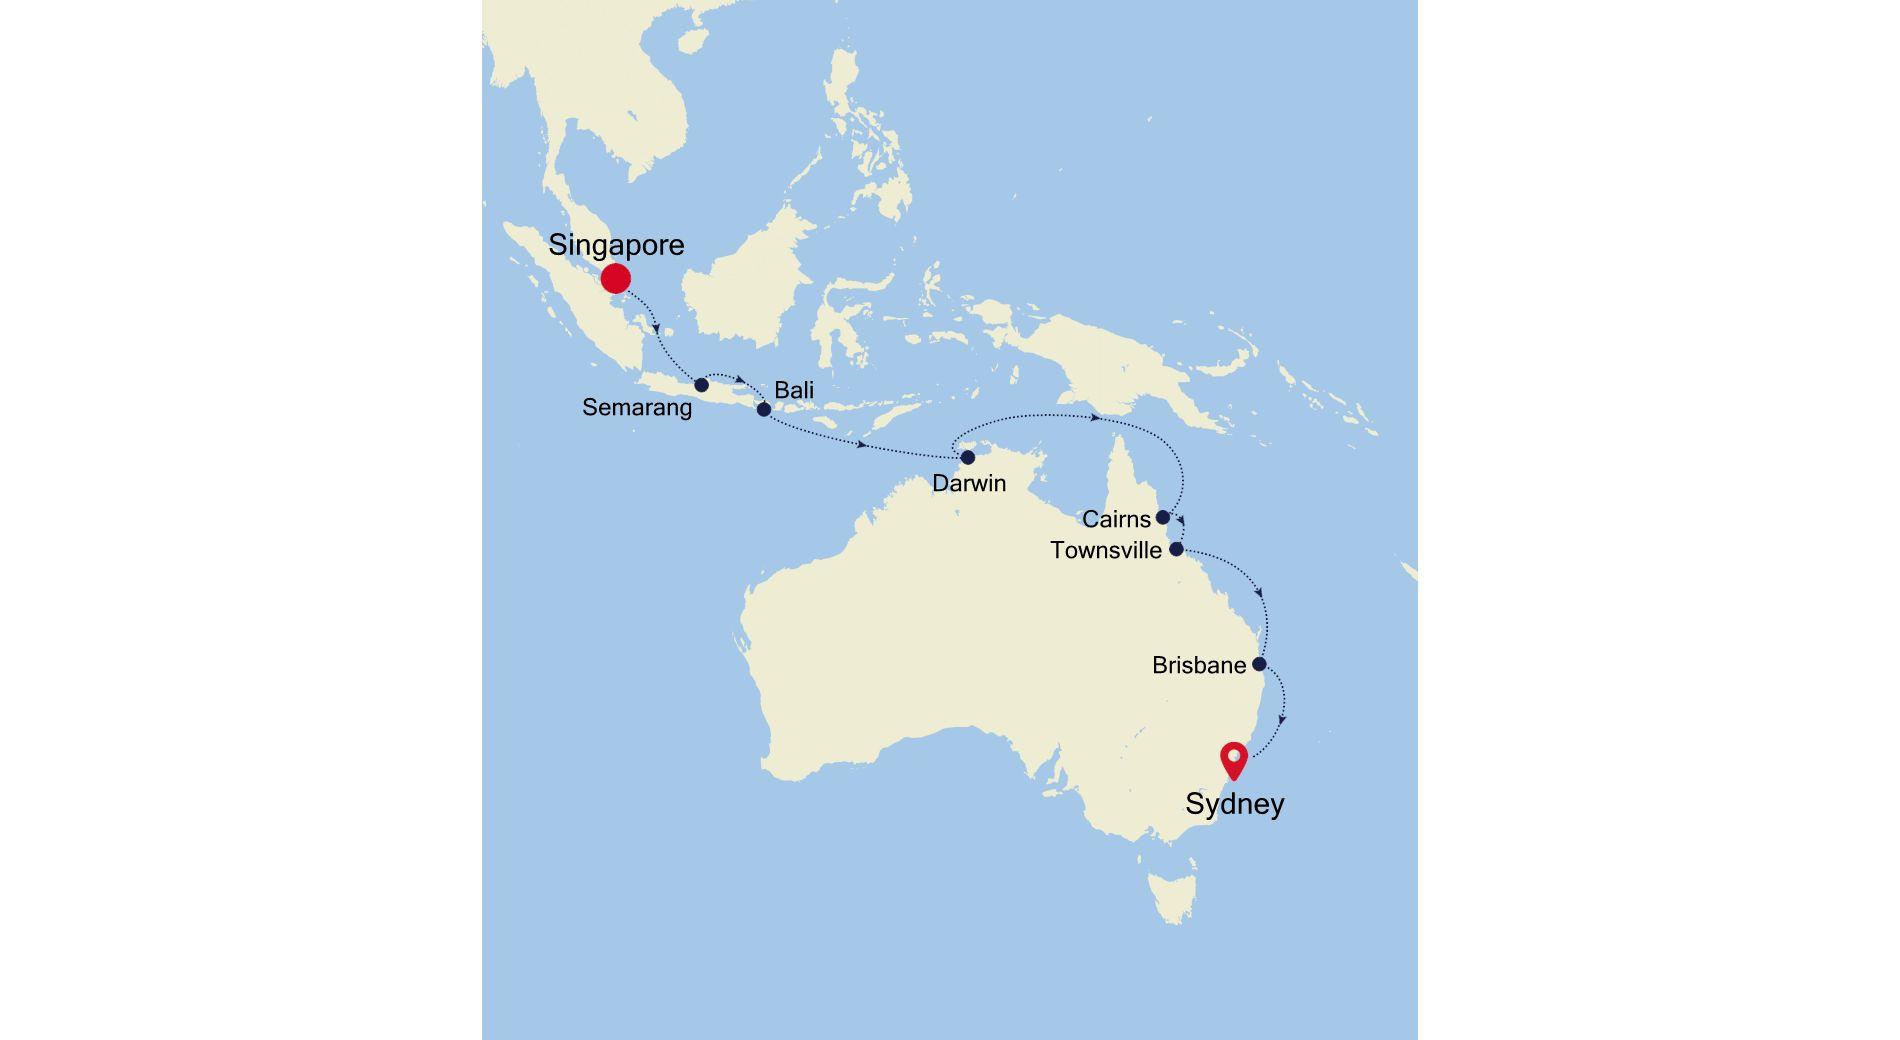 6930 - Singapore to Sydney